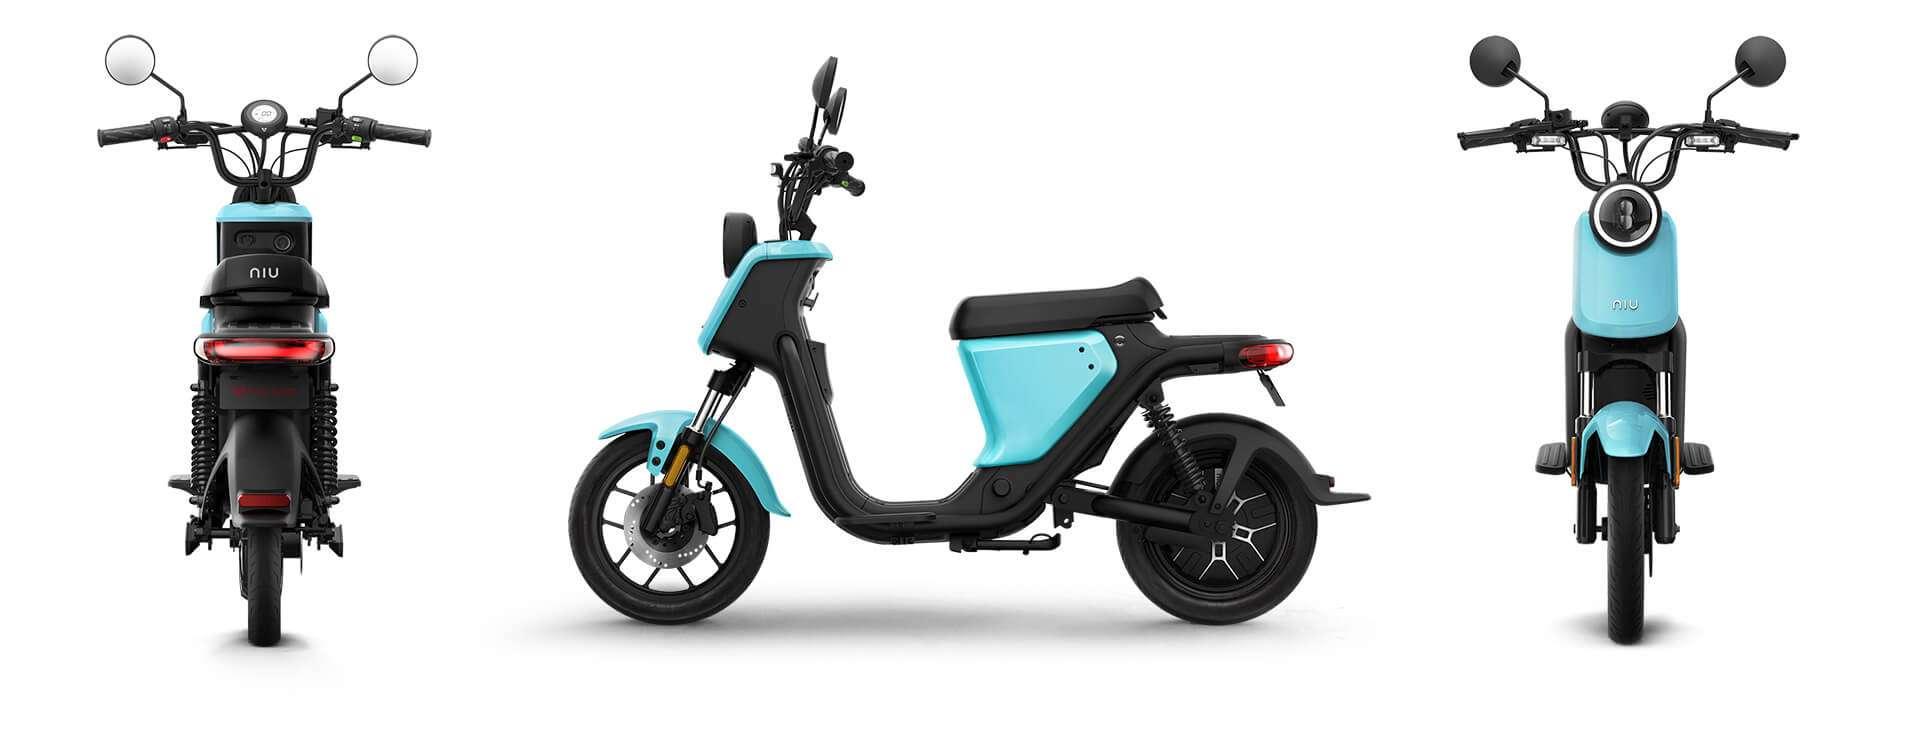 niu_uqi_pro_elektricni_moped_moder